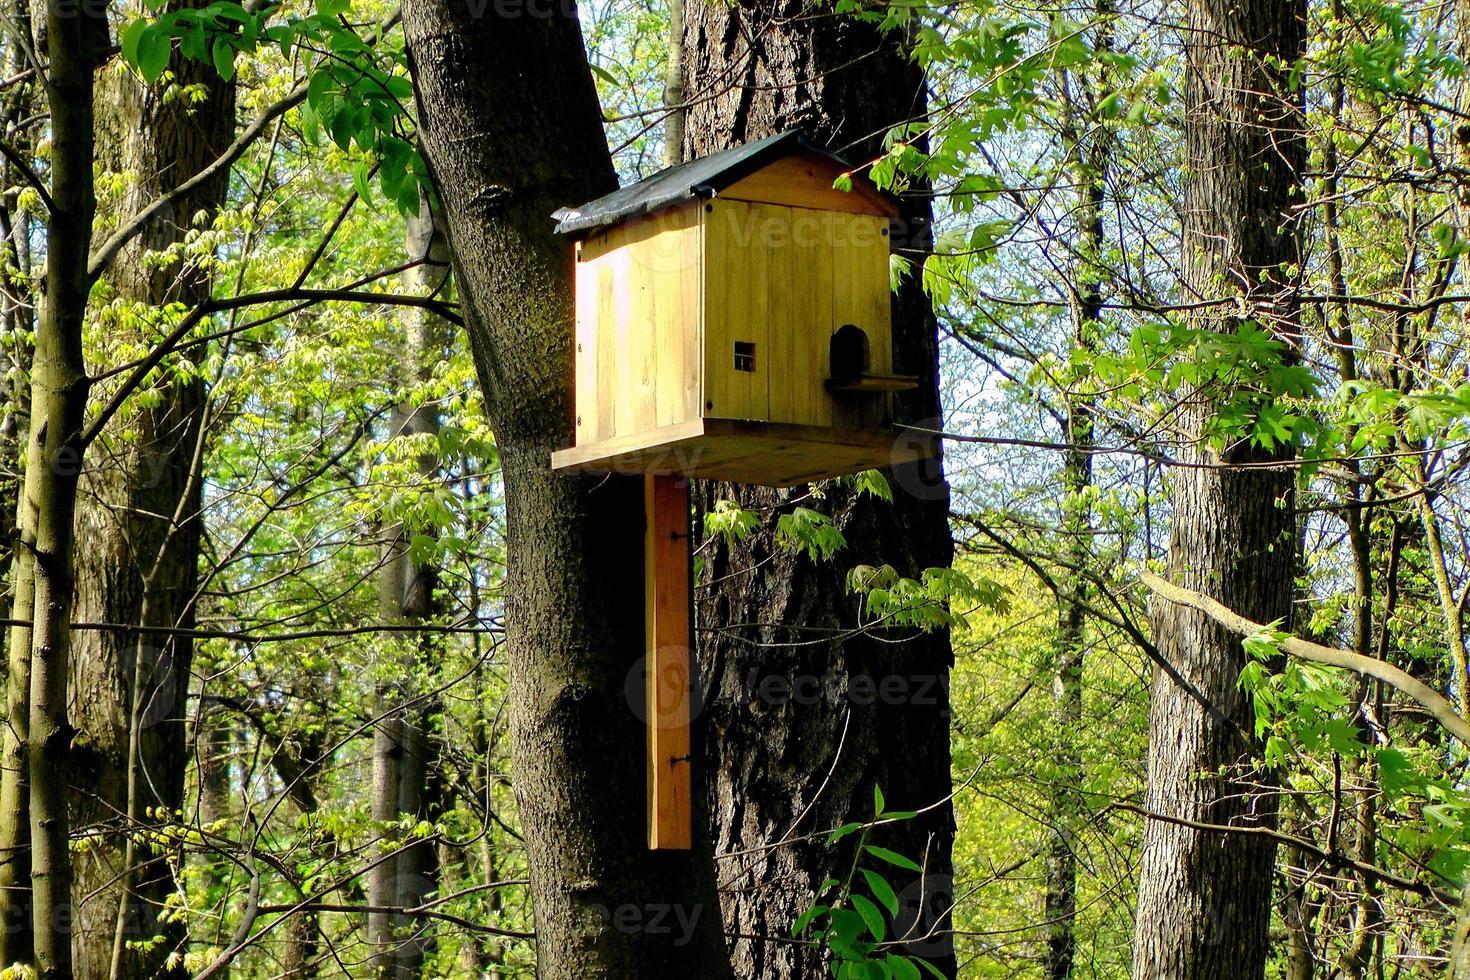 birdhouse foto